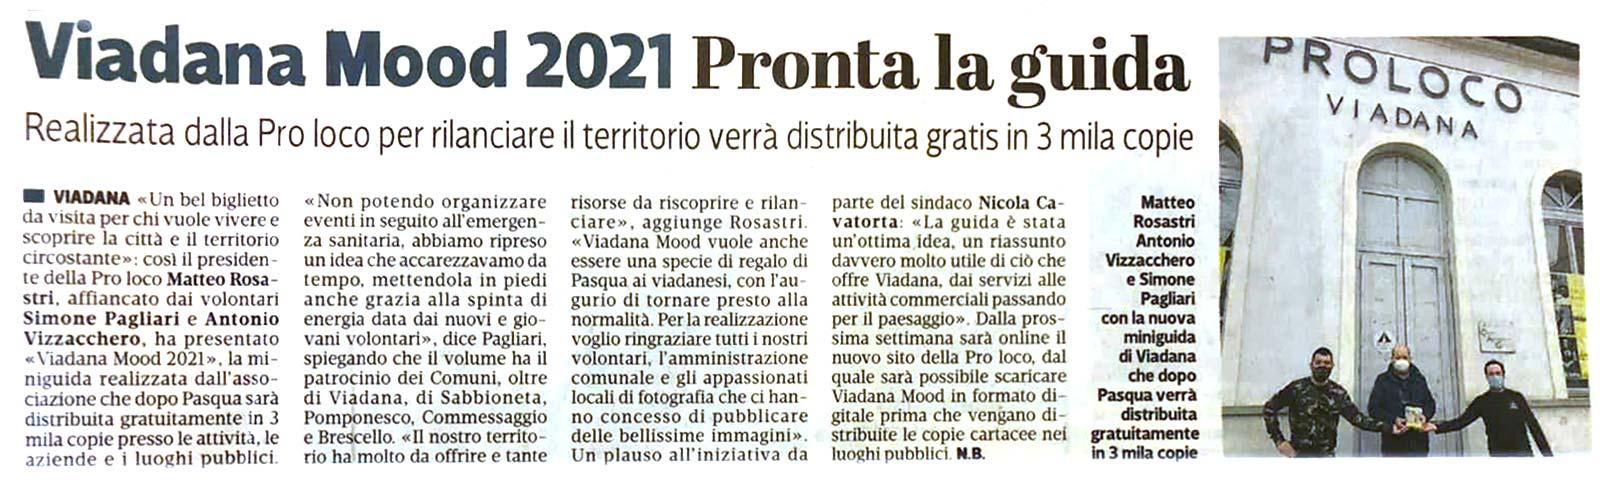 Proloco Viadana - Viadana Mood 2021 - articolo